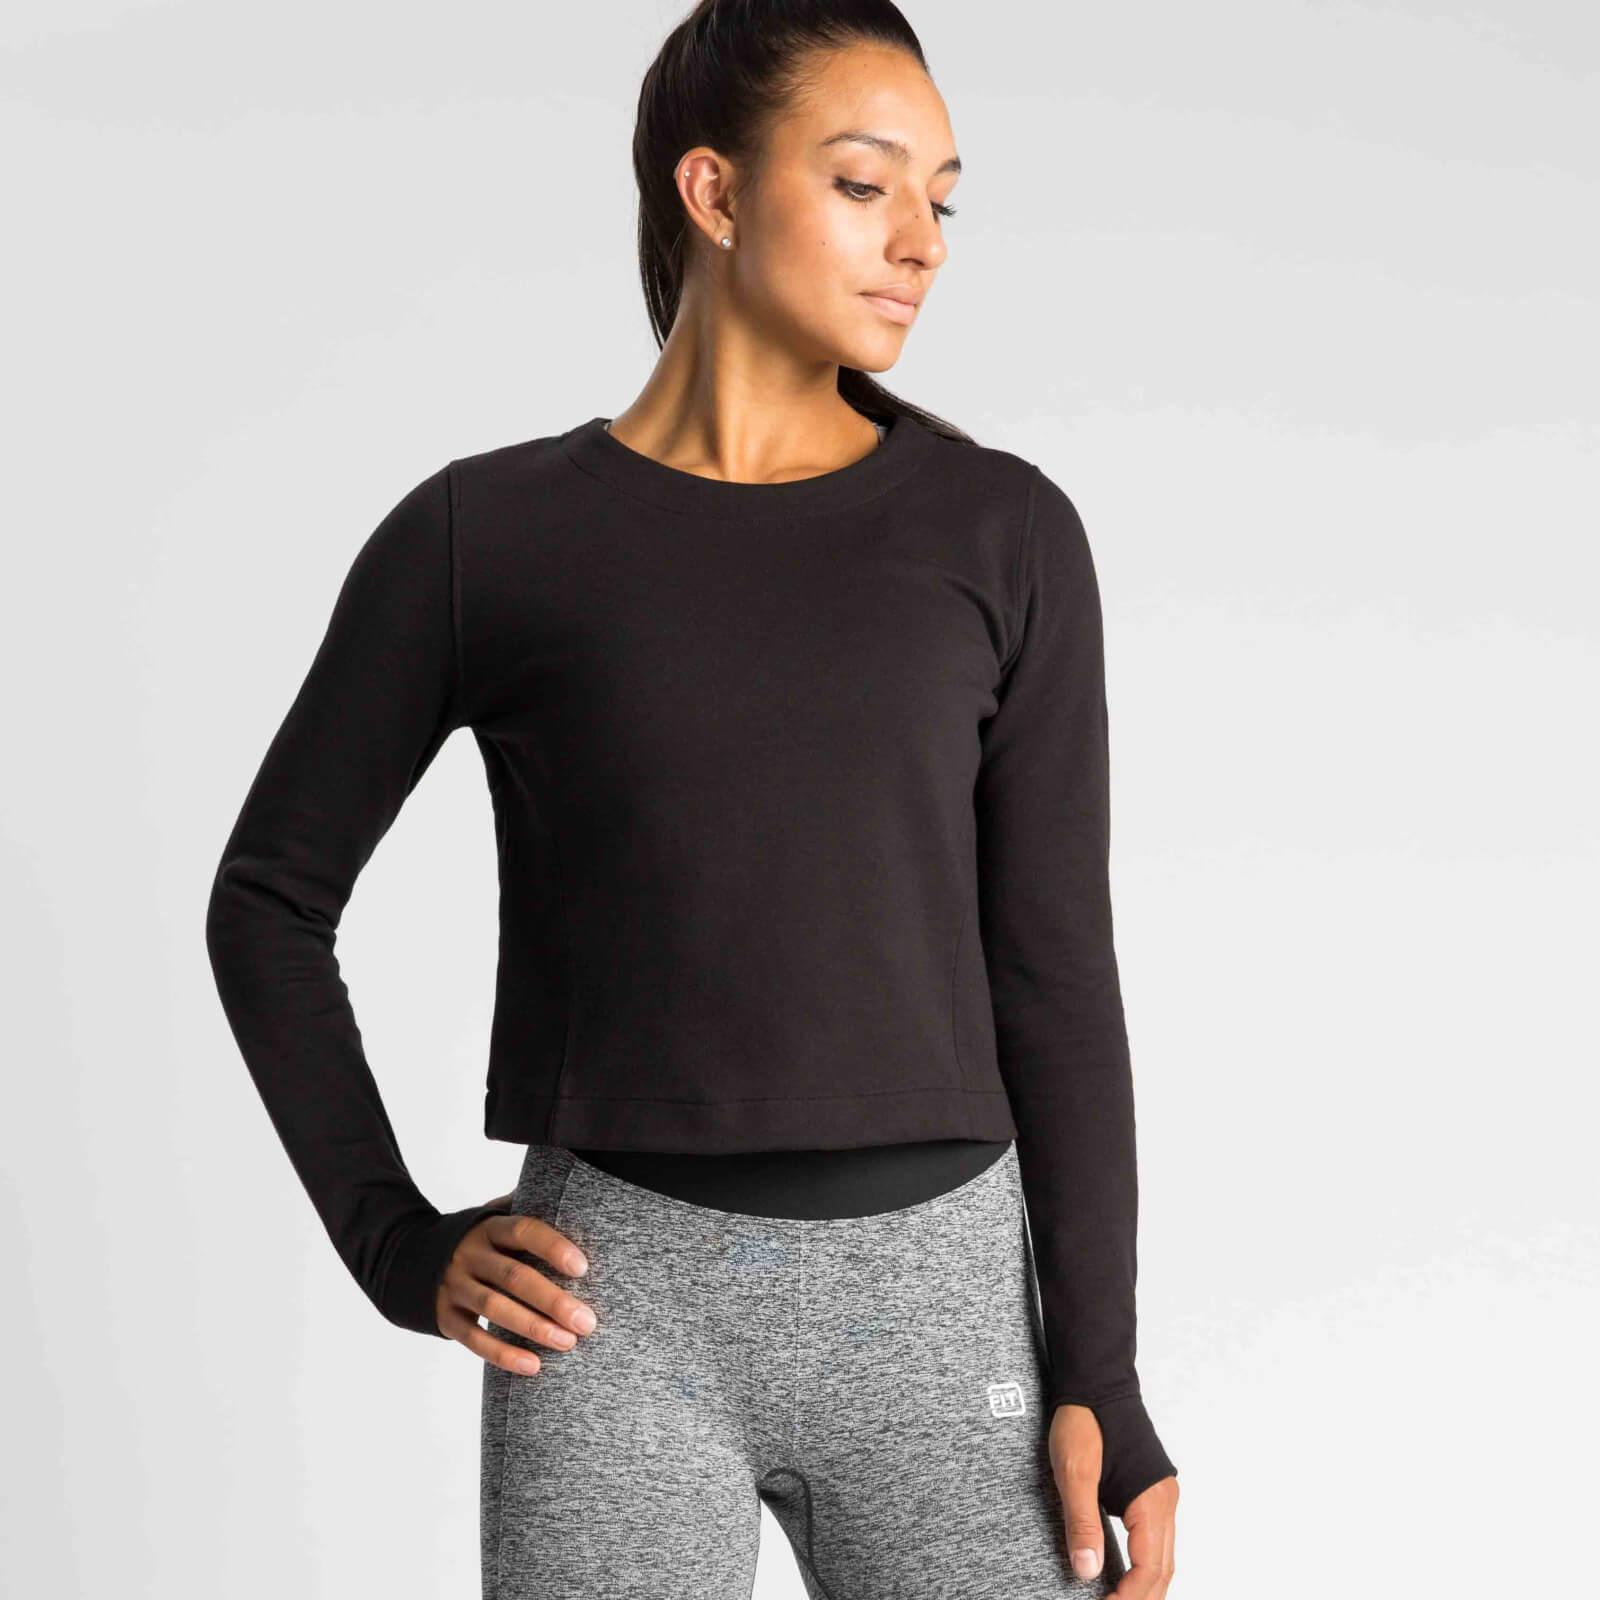 IdealFit Pro Tech Crew Sweatshirt - Black - XS - Black